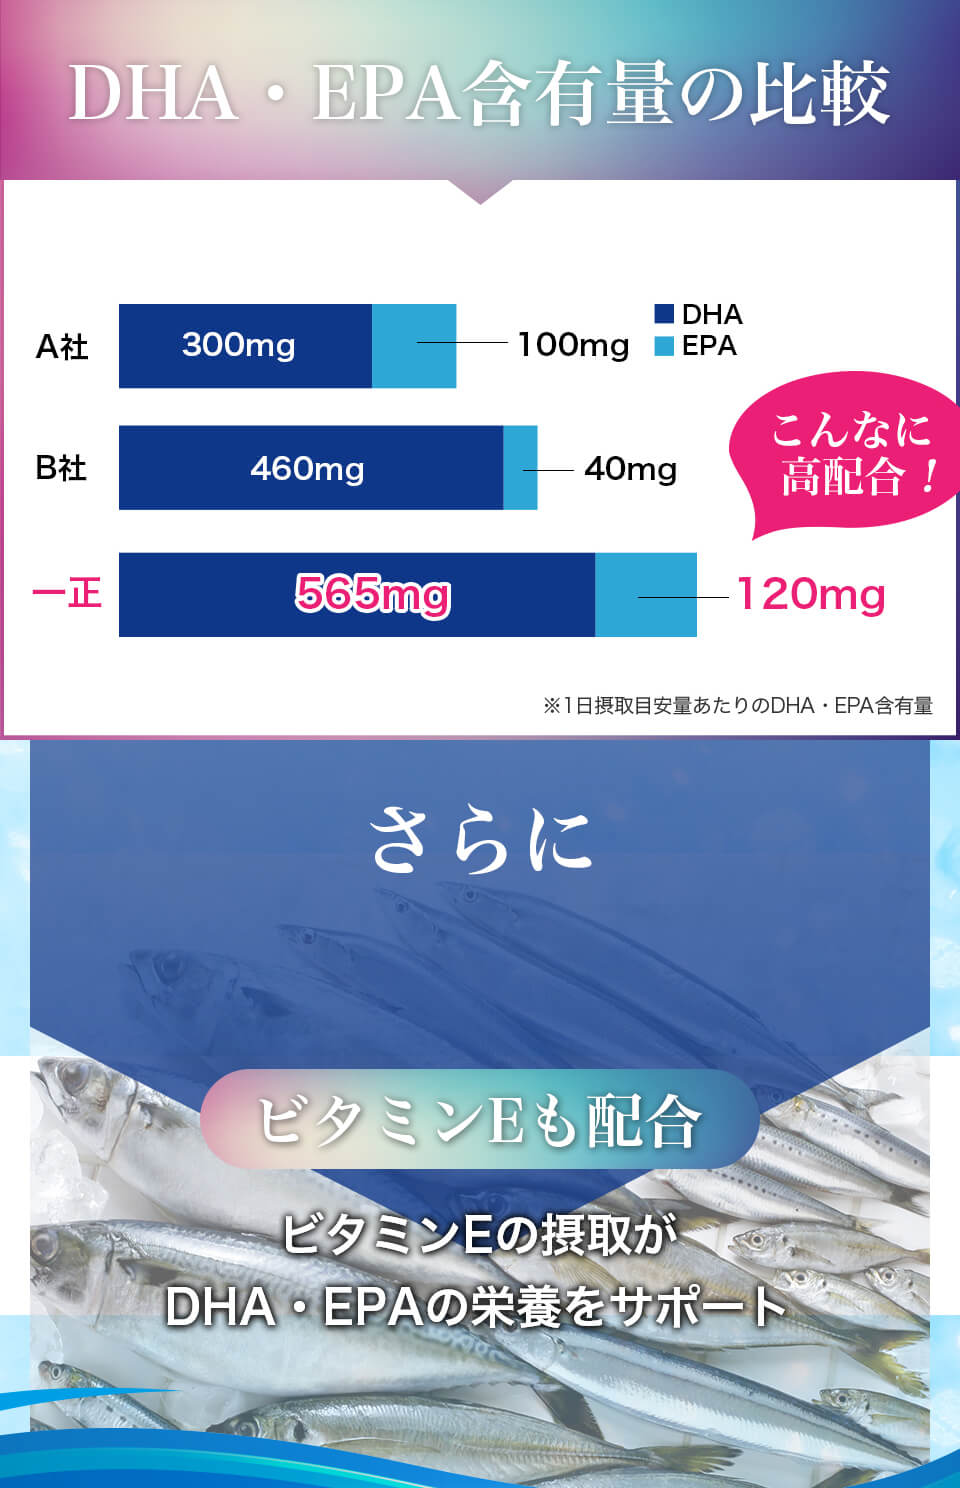 DHA&EPA+舞茸エキス サプリメント n︲3系脂肪酸 ビタミンE ビタミンEの摂取が DHA・EPAの栄養をサポート